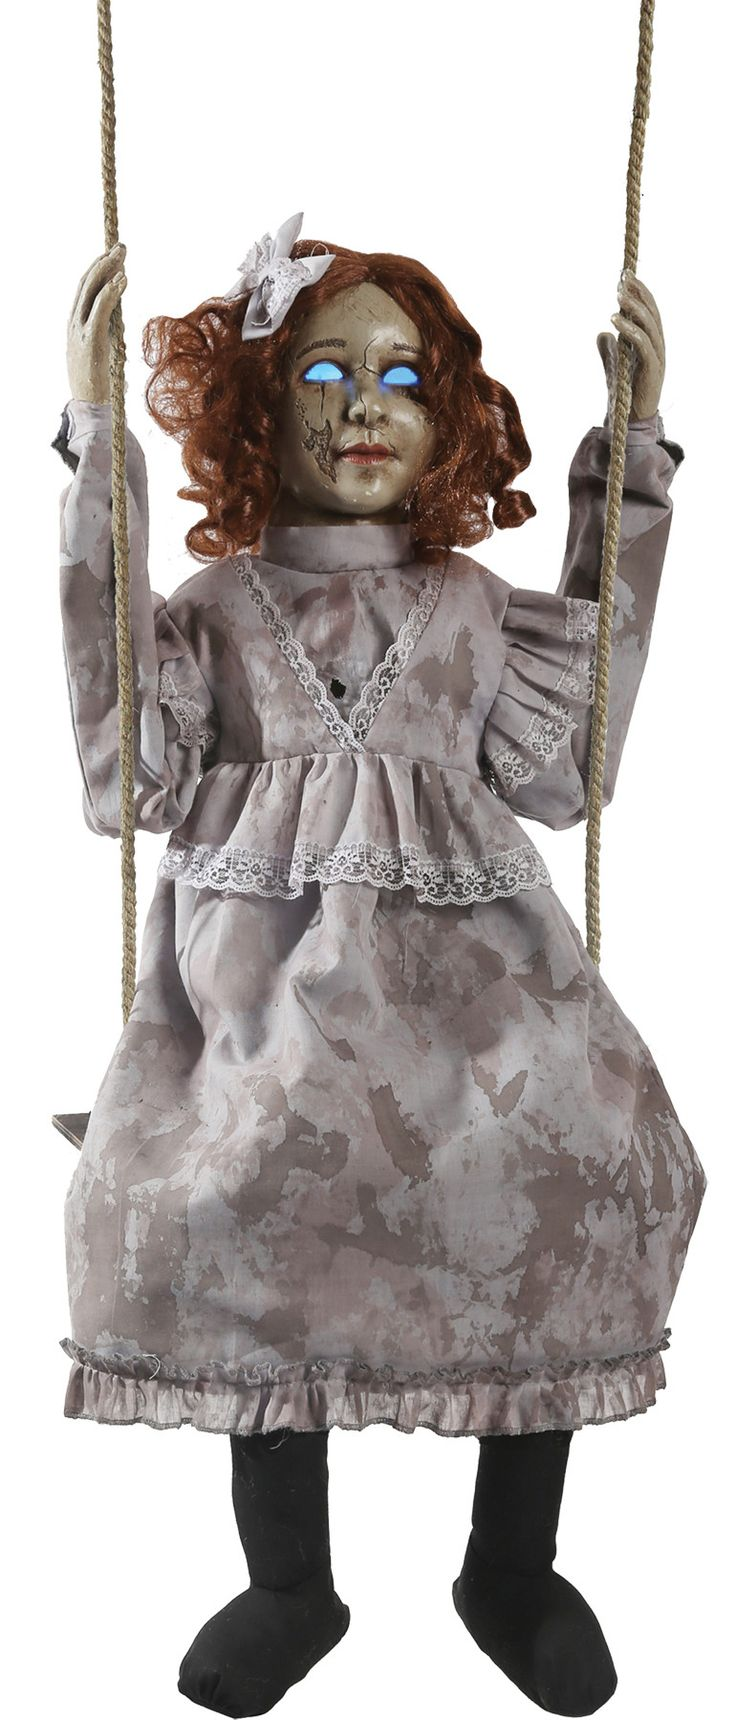 Best 20+ Haunted dolls ideas on Pinterest   Haunted dollhouse ...